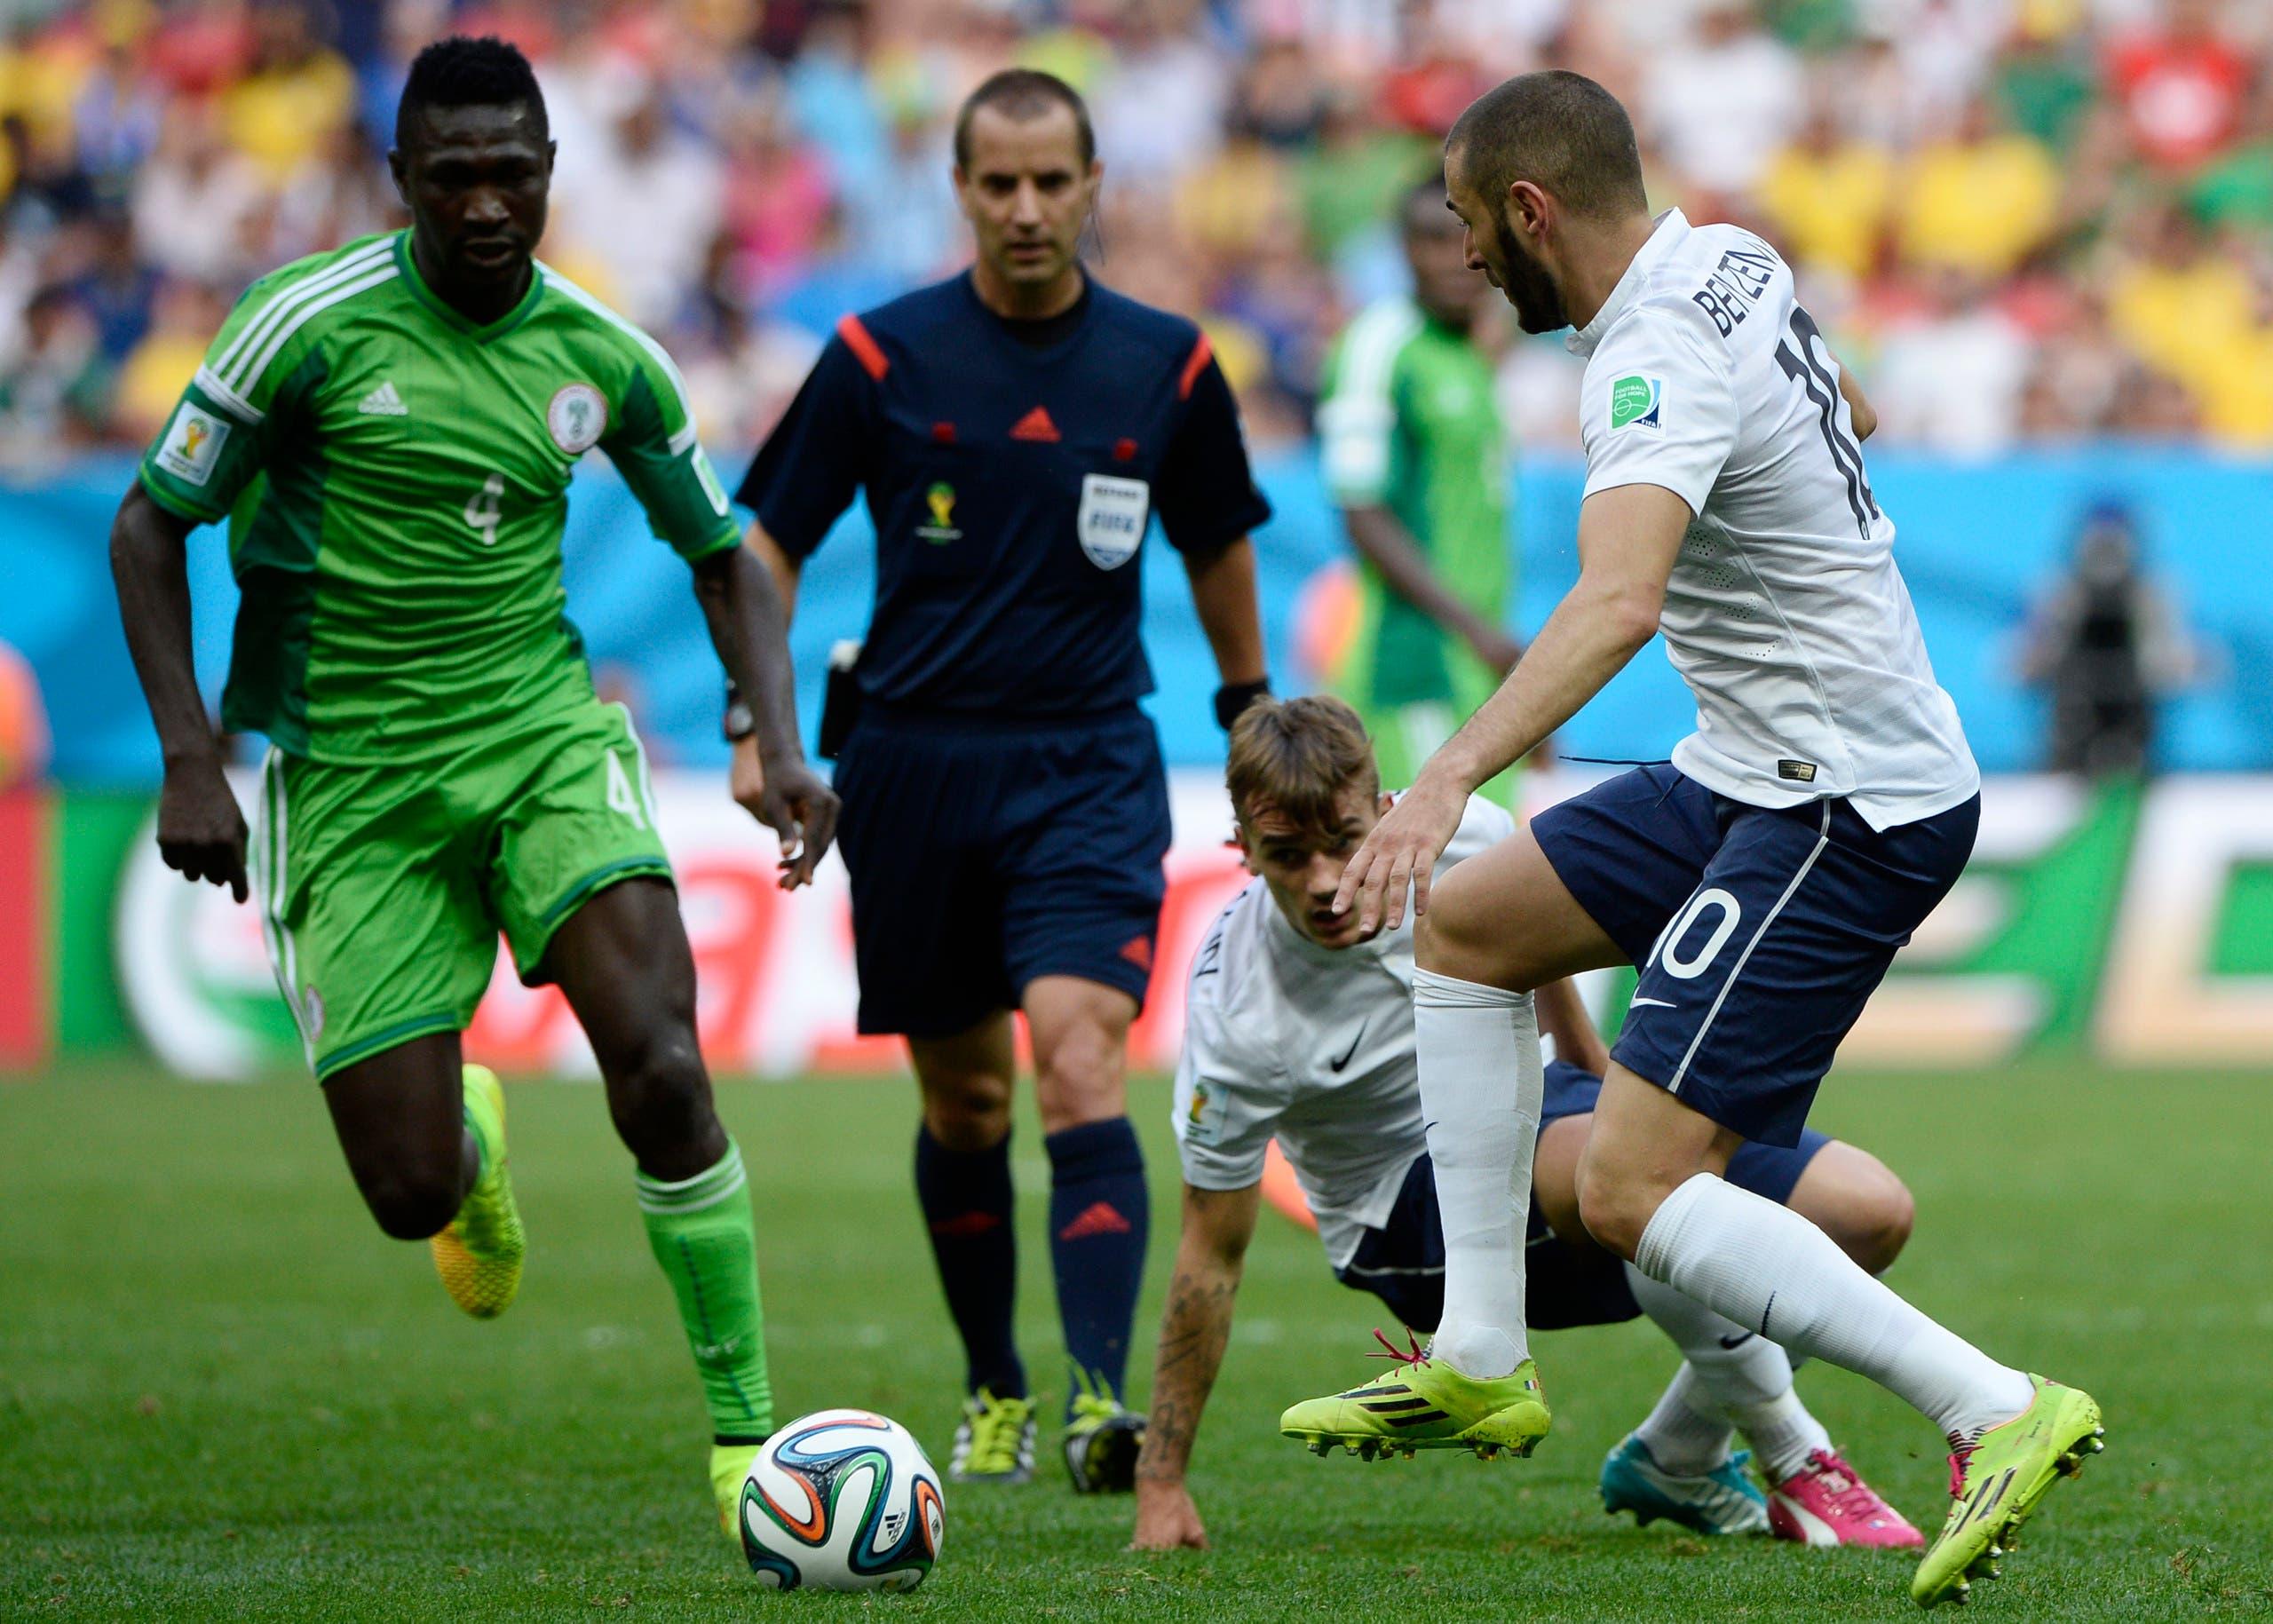 غابرييل أمام فرنسا في مونديال 2014